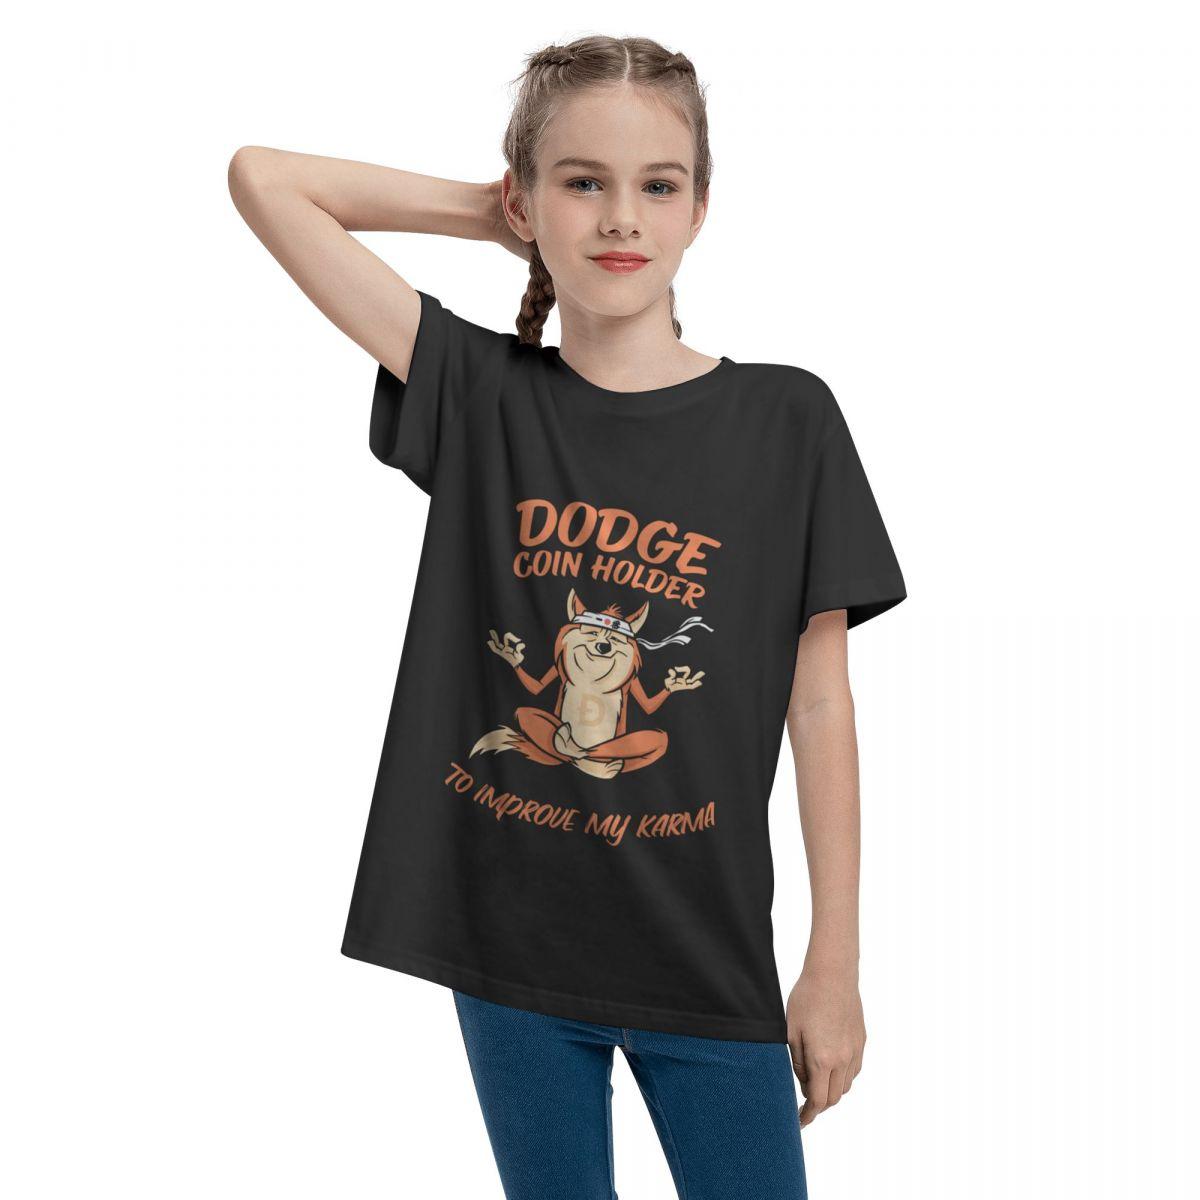 Crypto Dogecoin Karma Funny Teenage T-shirt Unisex Comfortable Fashion Summer Tops 100% Cotton